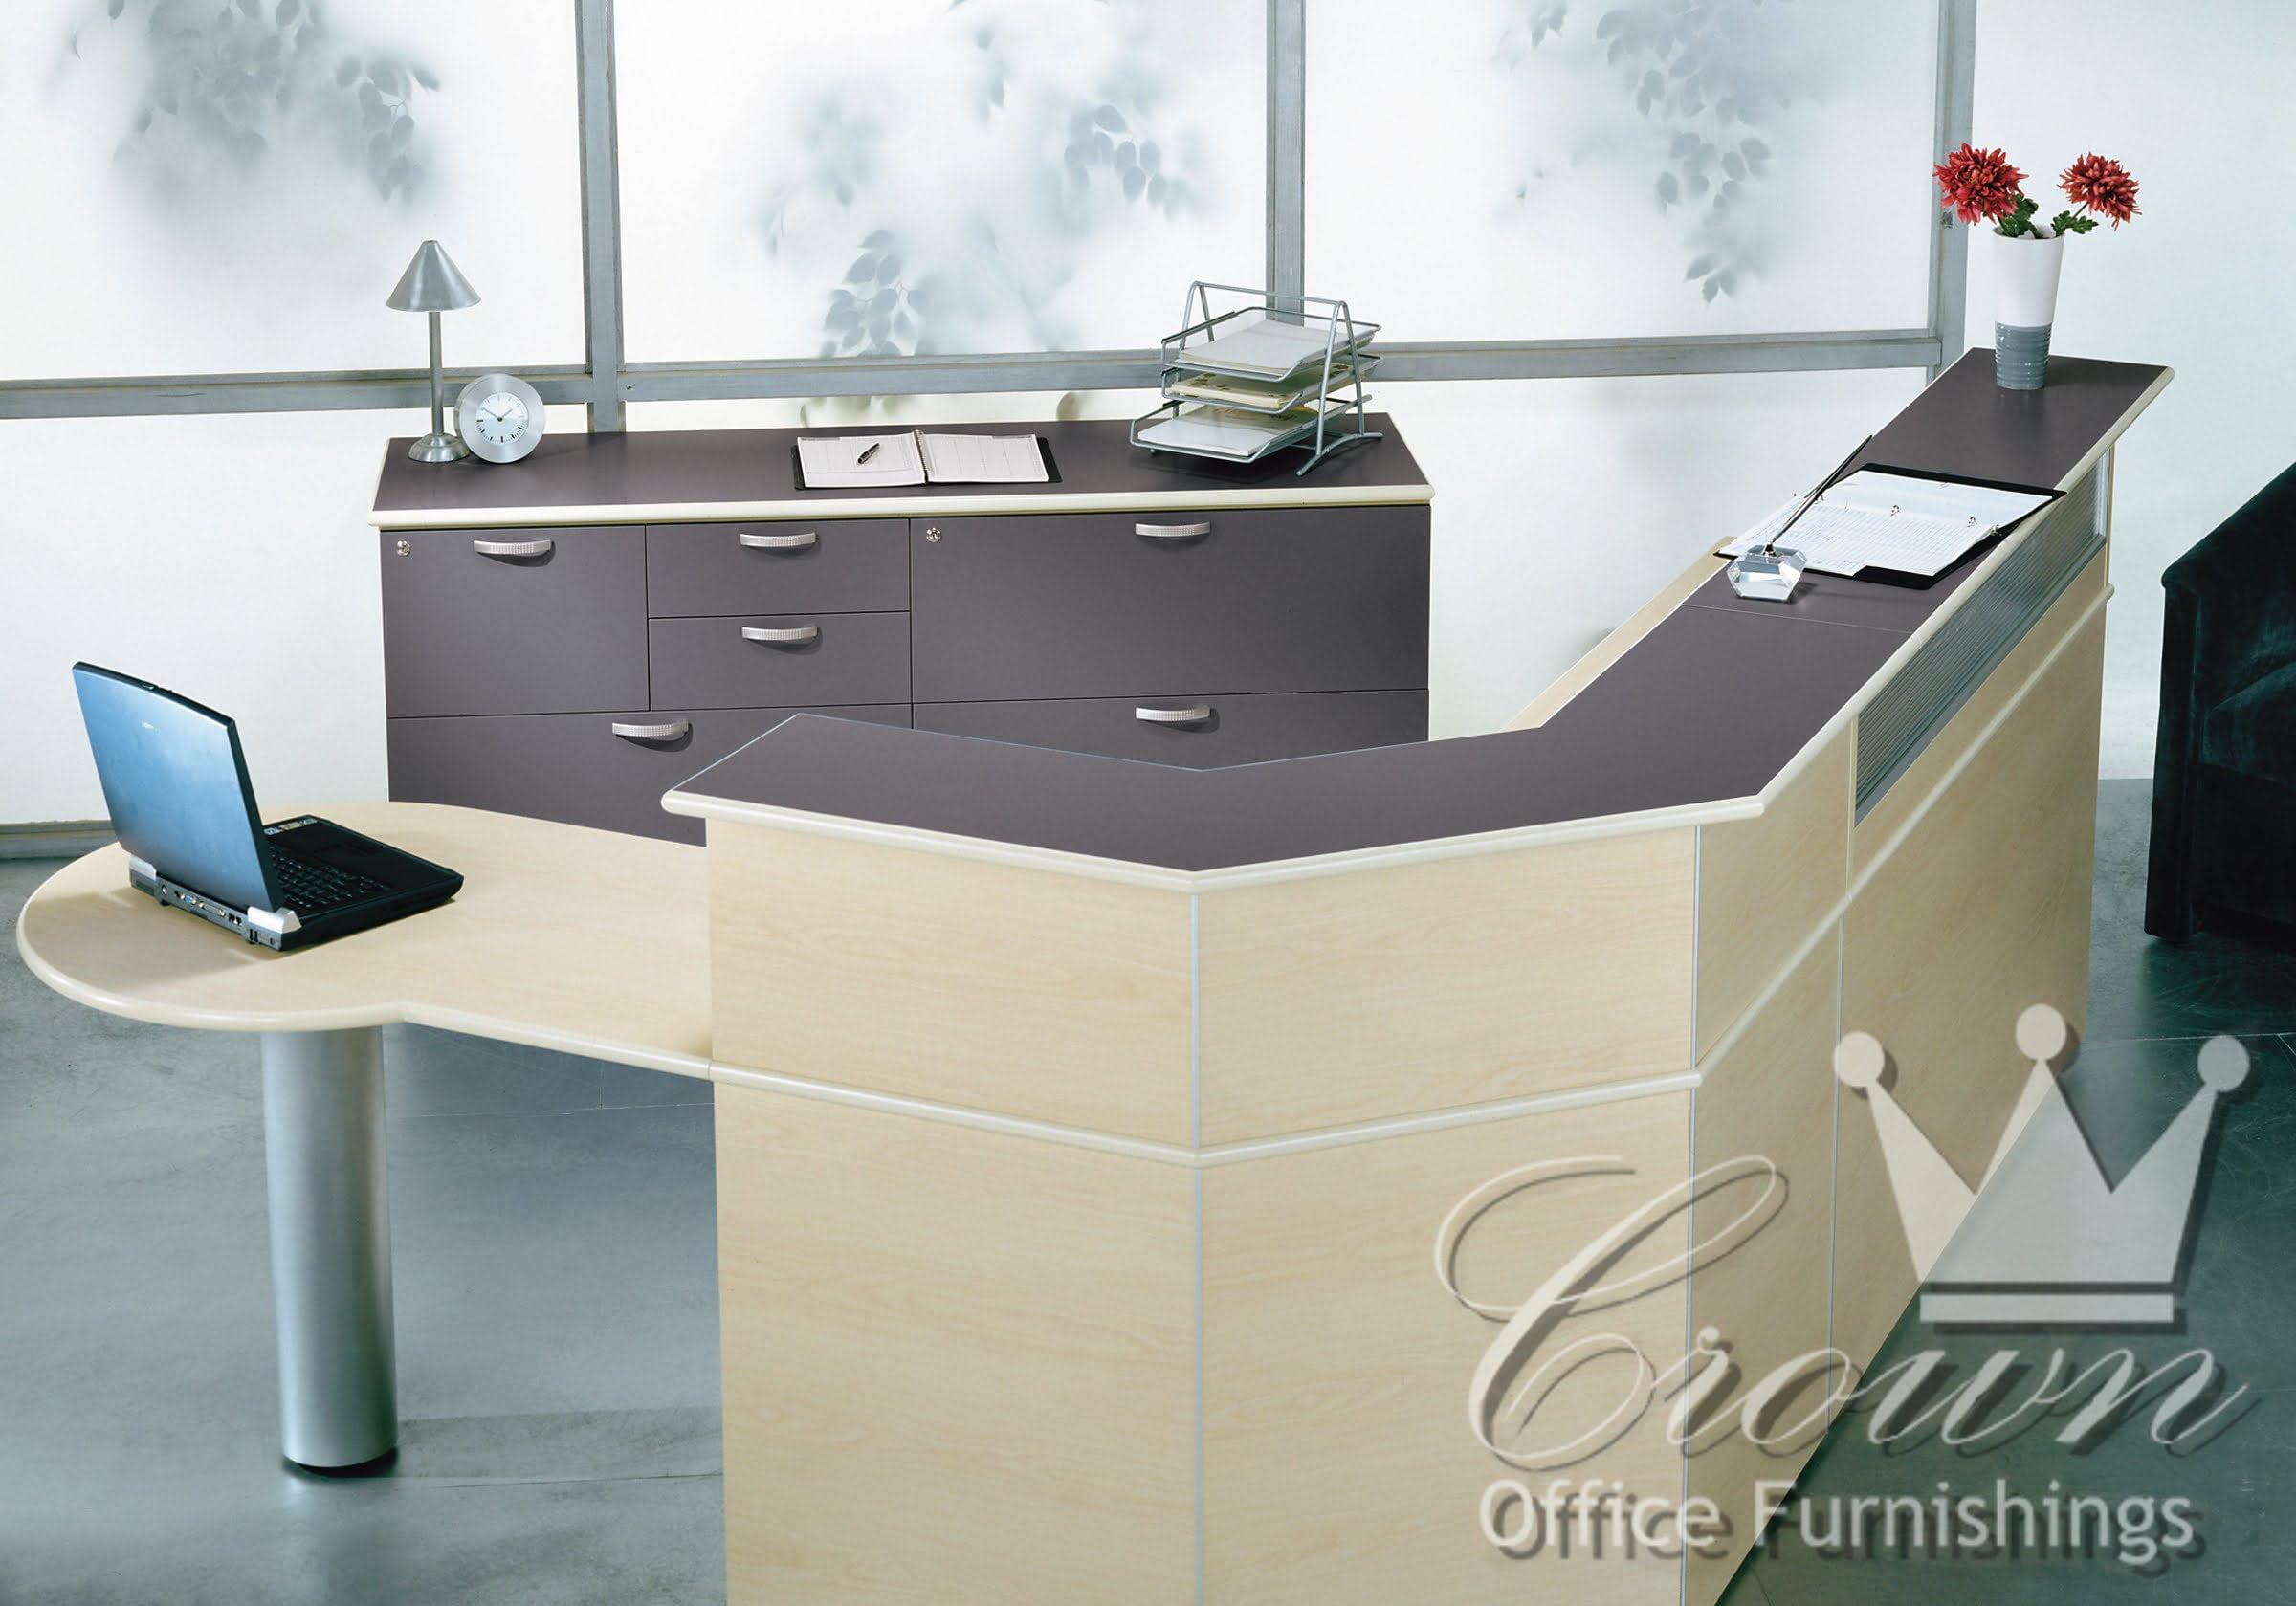 sauder computer desk instructions pdf